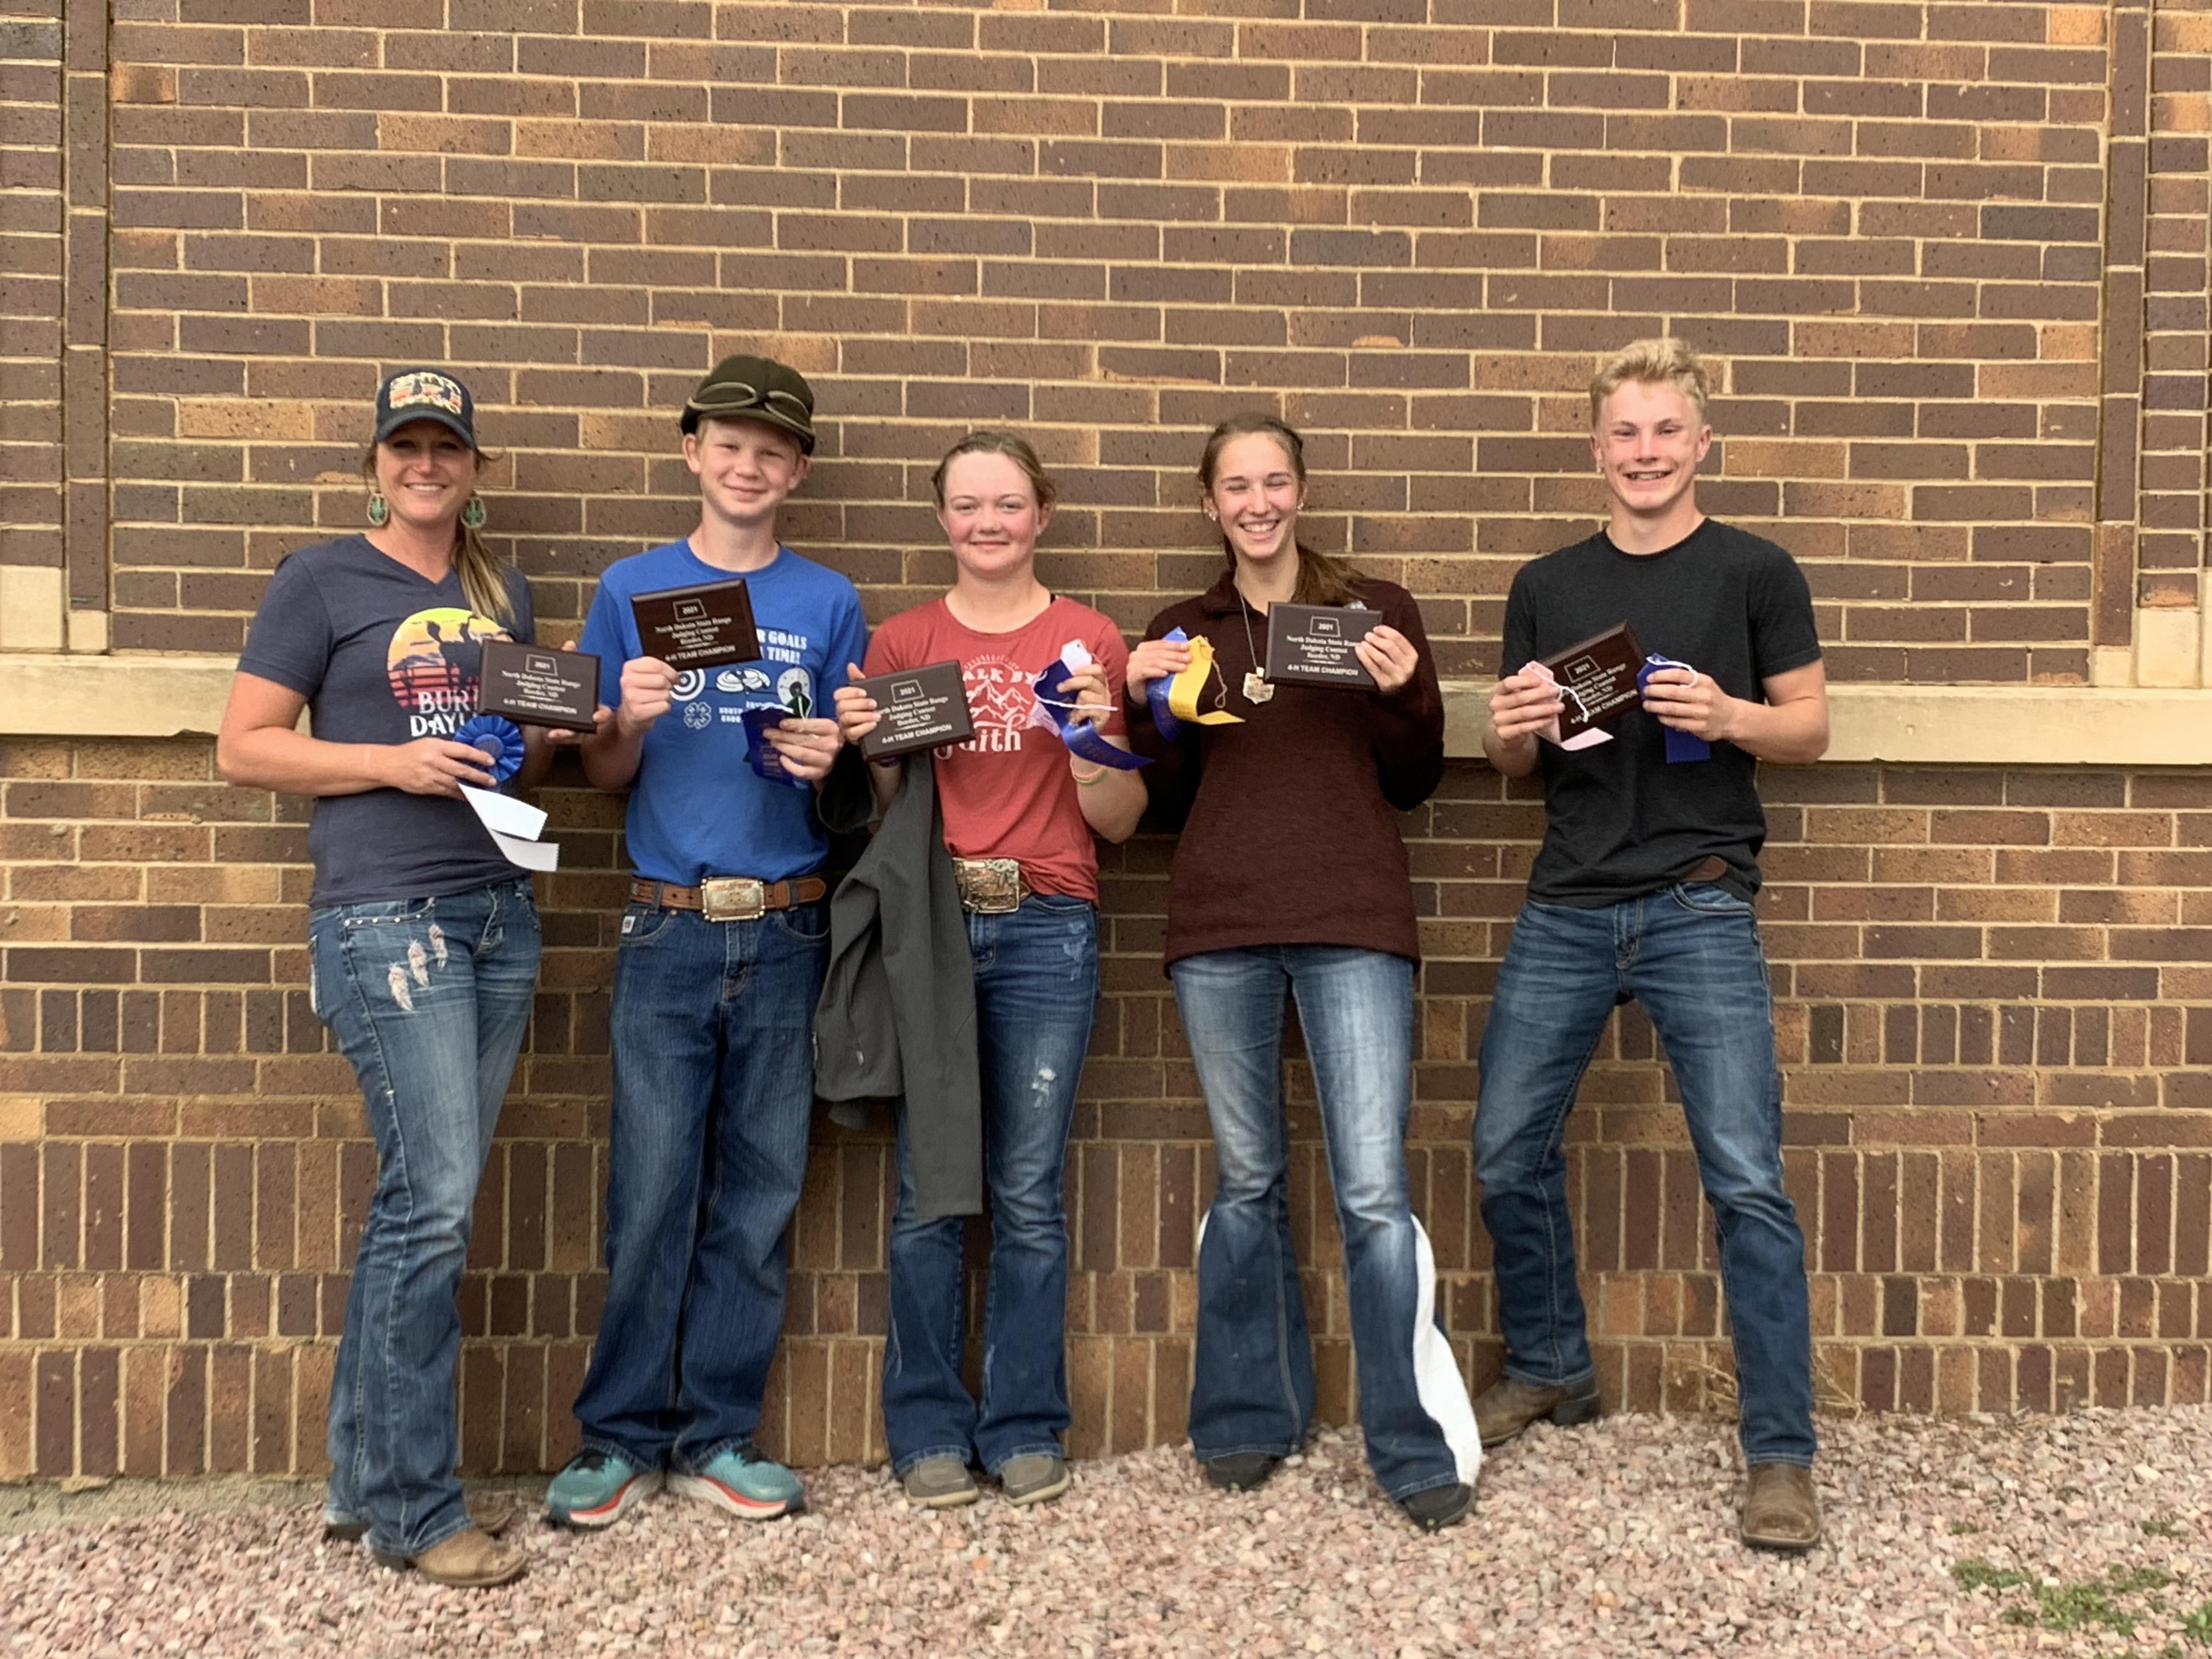 McKenzie County's senior 4-H range judging team will represent North Dakota in national competition in Oklahoma. (NDSU photo)